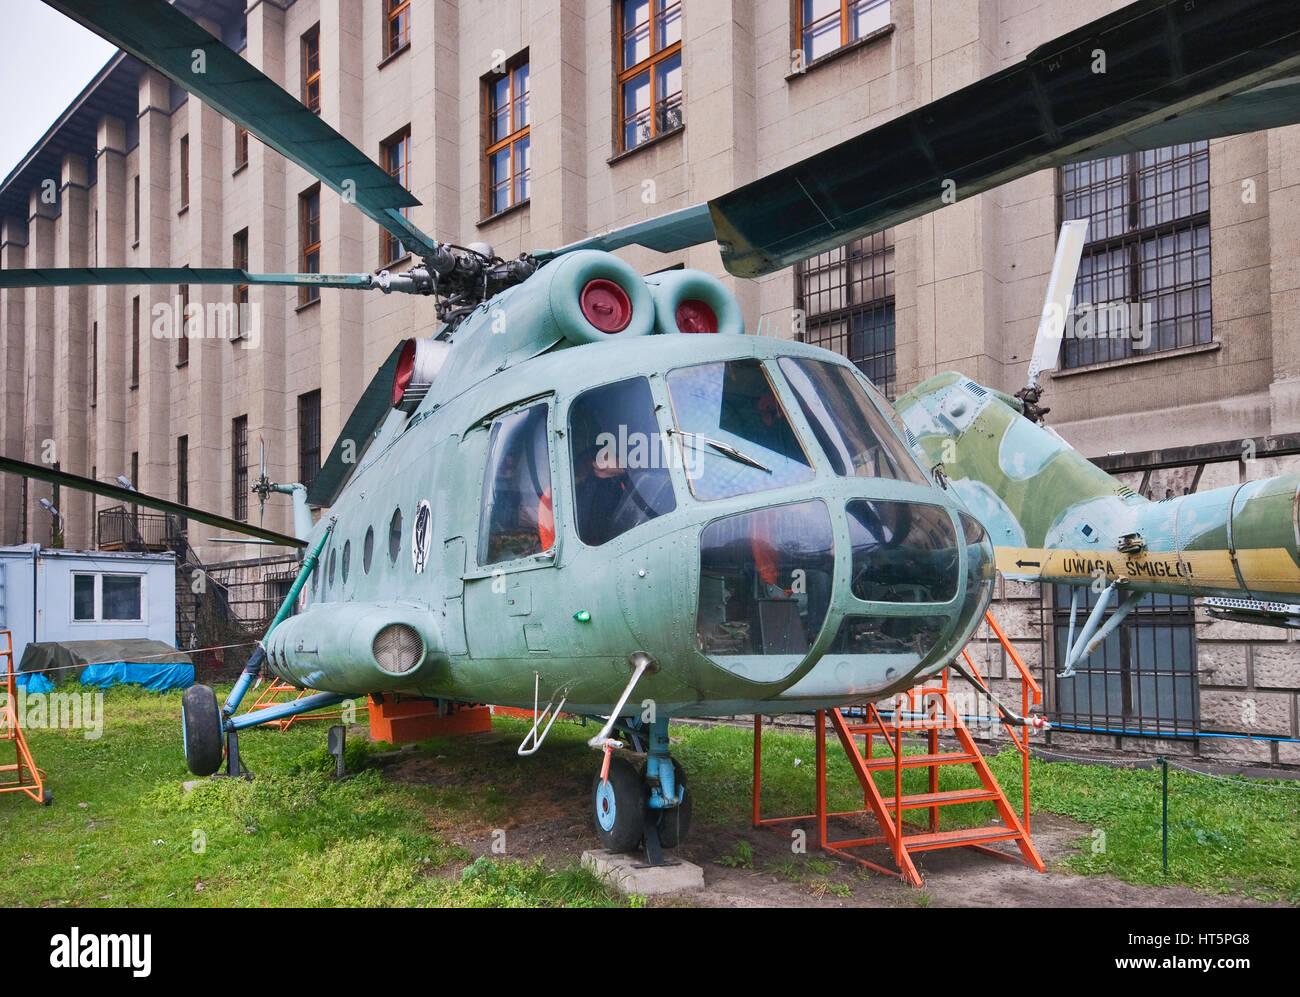 Mil Mi-8T, Soviet medium twin-turbine assault transport helicopter, Polish Army Museum in Warsaw, Poland - Stock Image